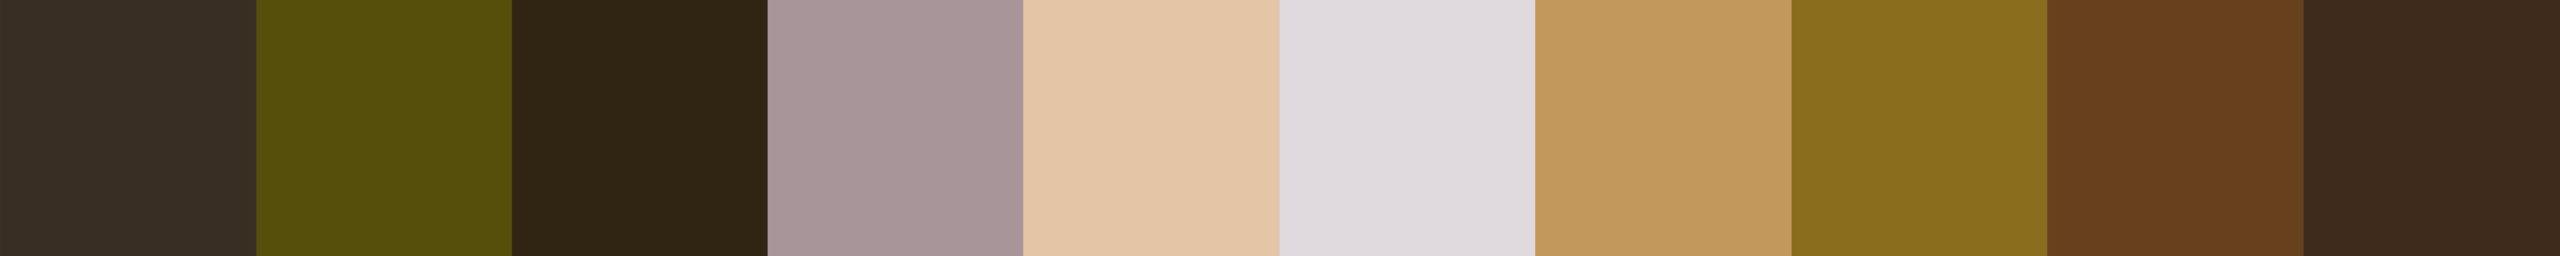 756 Ligramia Color Palette